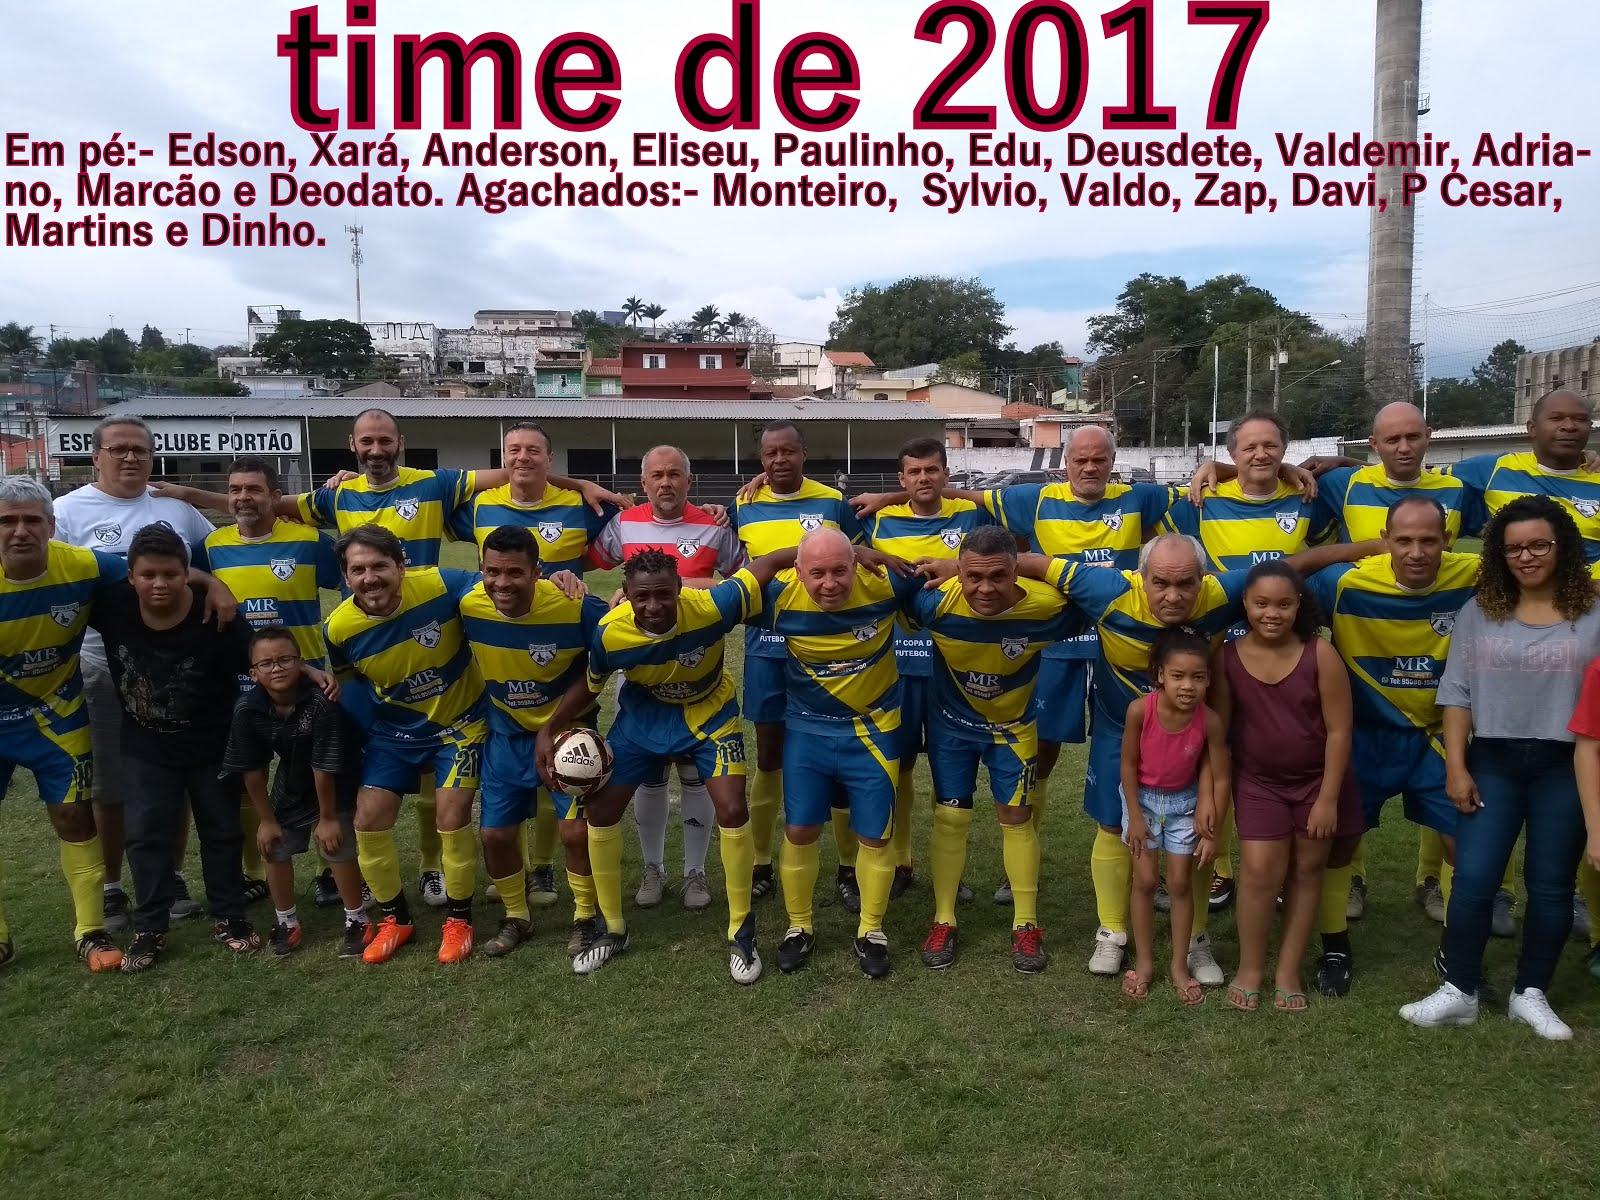 time de 2017